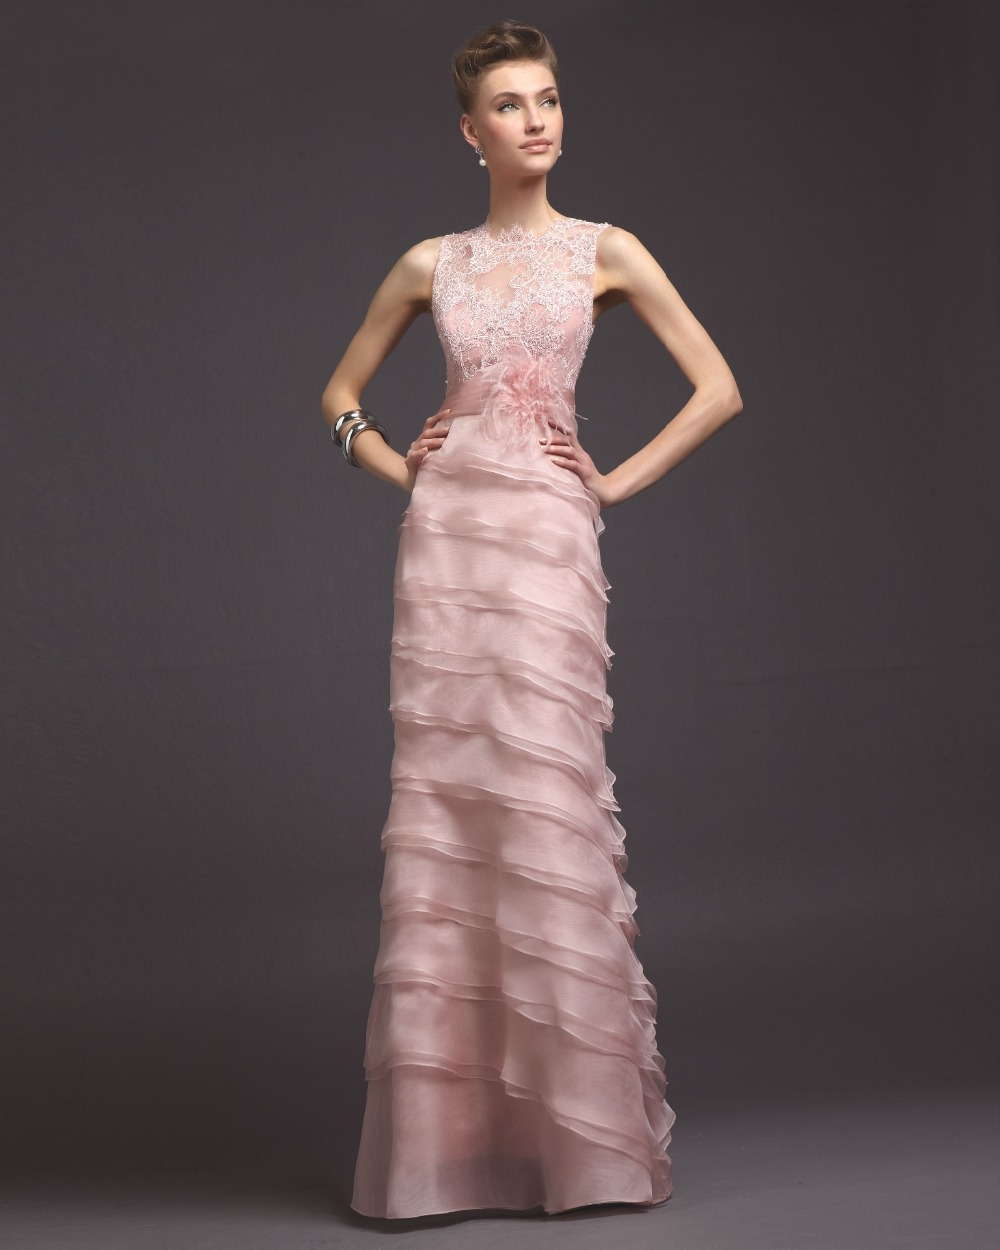 Tops for Formal Evening Wear Promotion-Shop for Promotional Tops ...